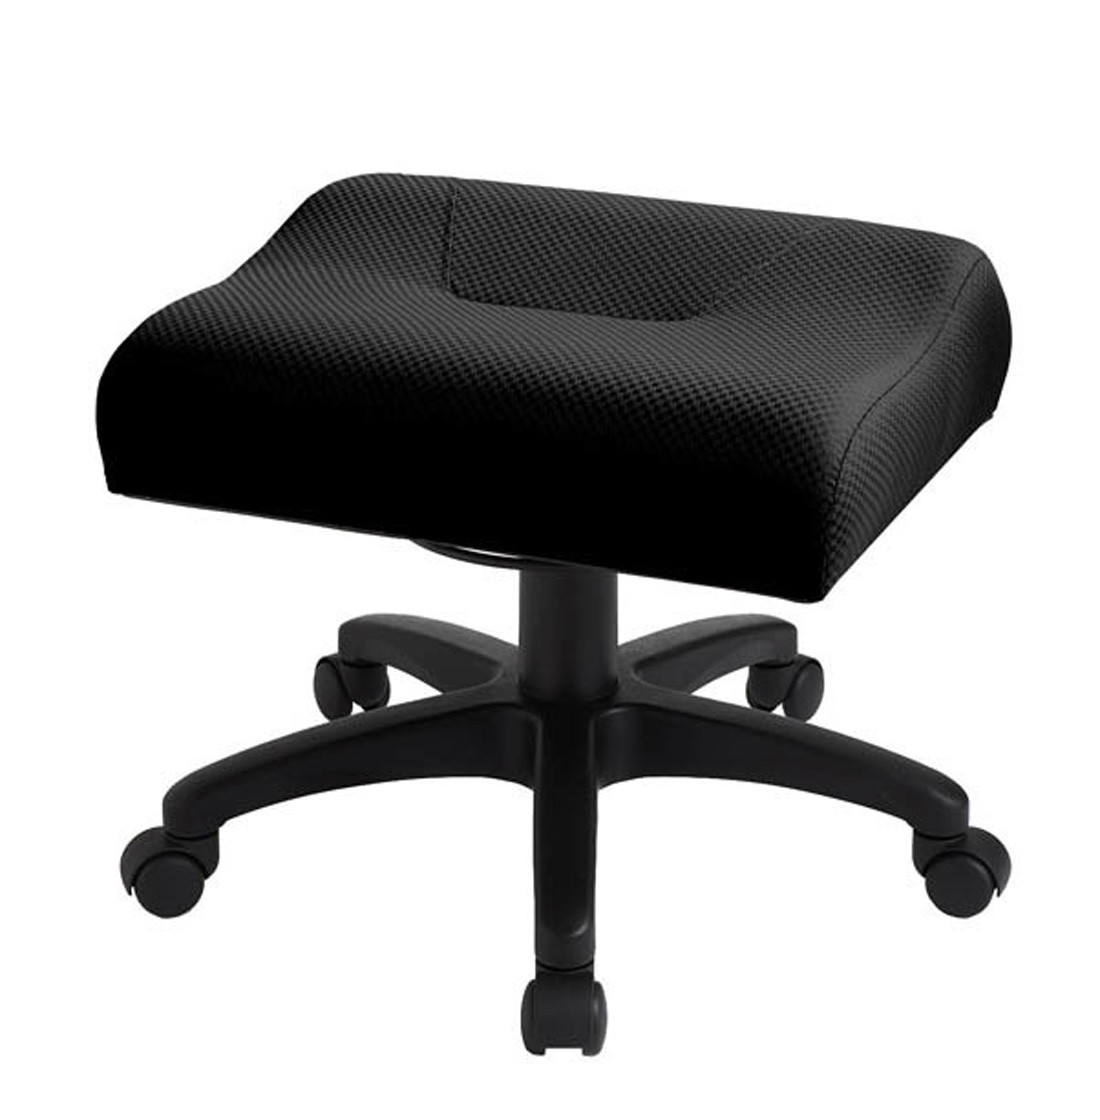 Terrific Ergocentric Adjustable Height Leg Rest Padded Foot Stool Inzonedesignstudio Interior Chair Design Inzonedesignstudiocom